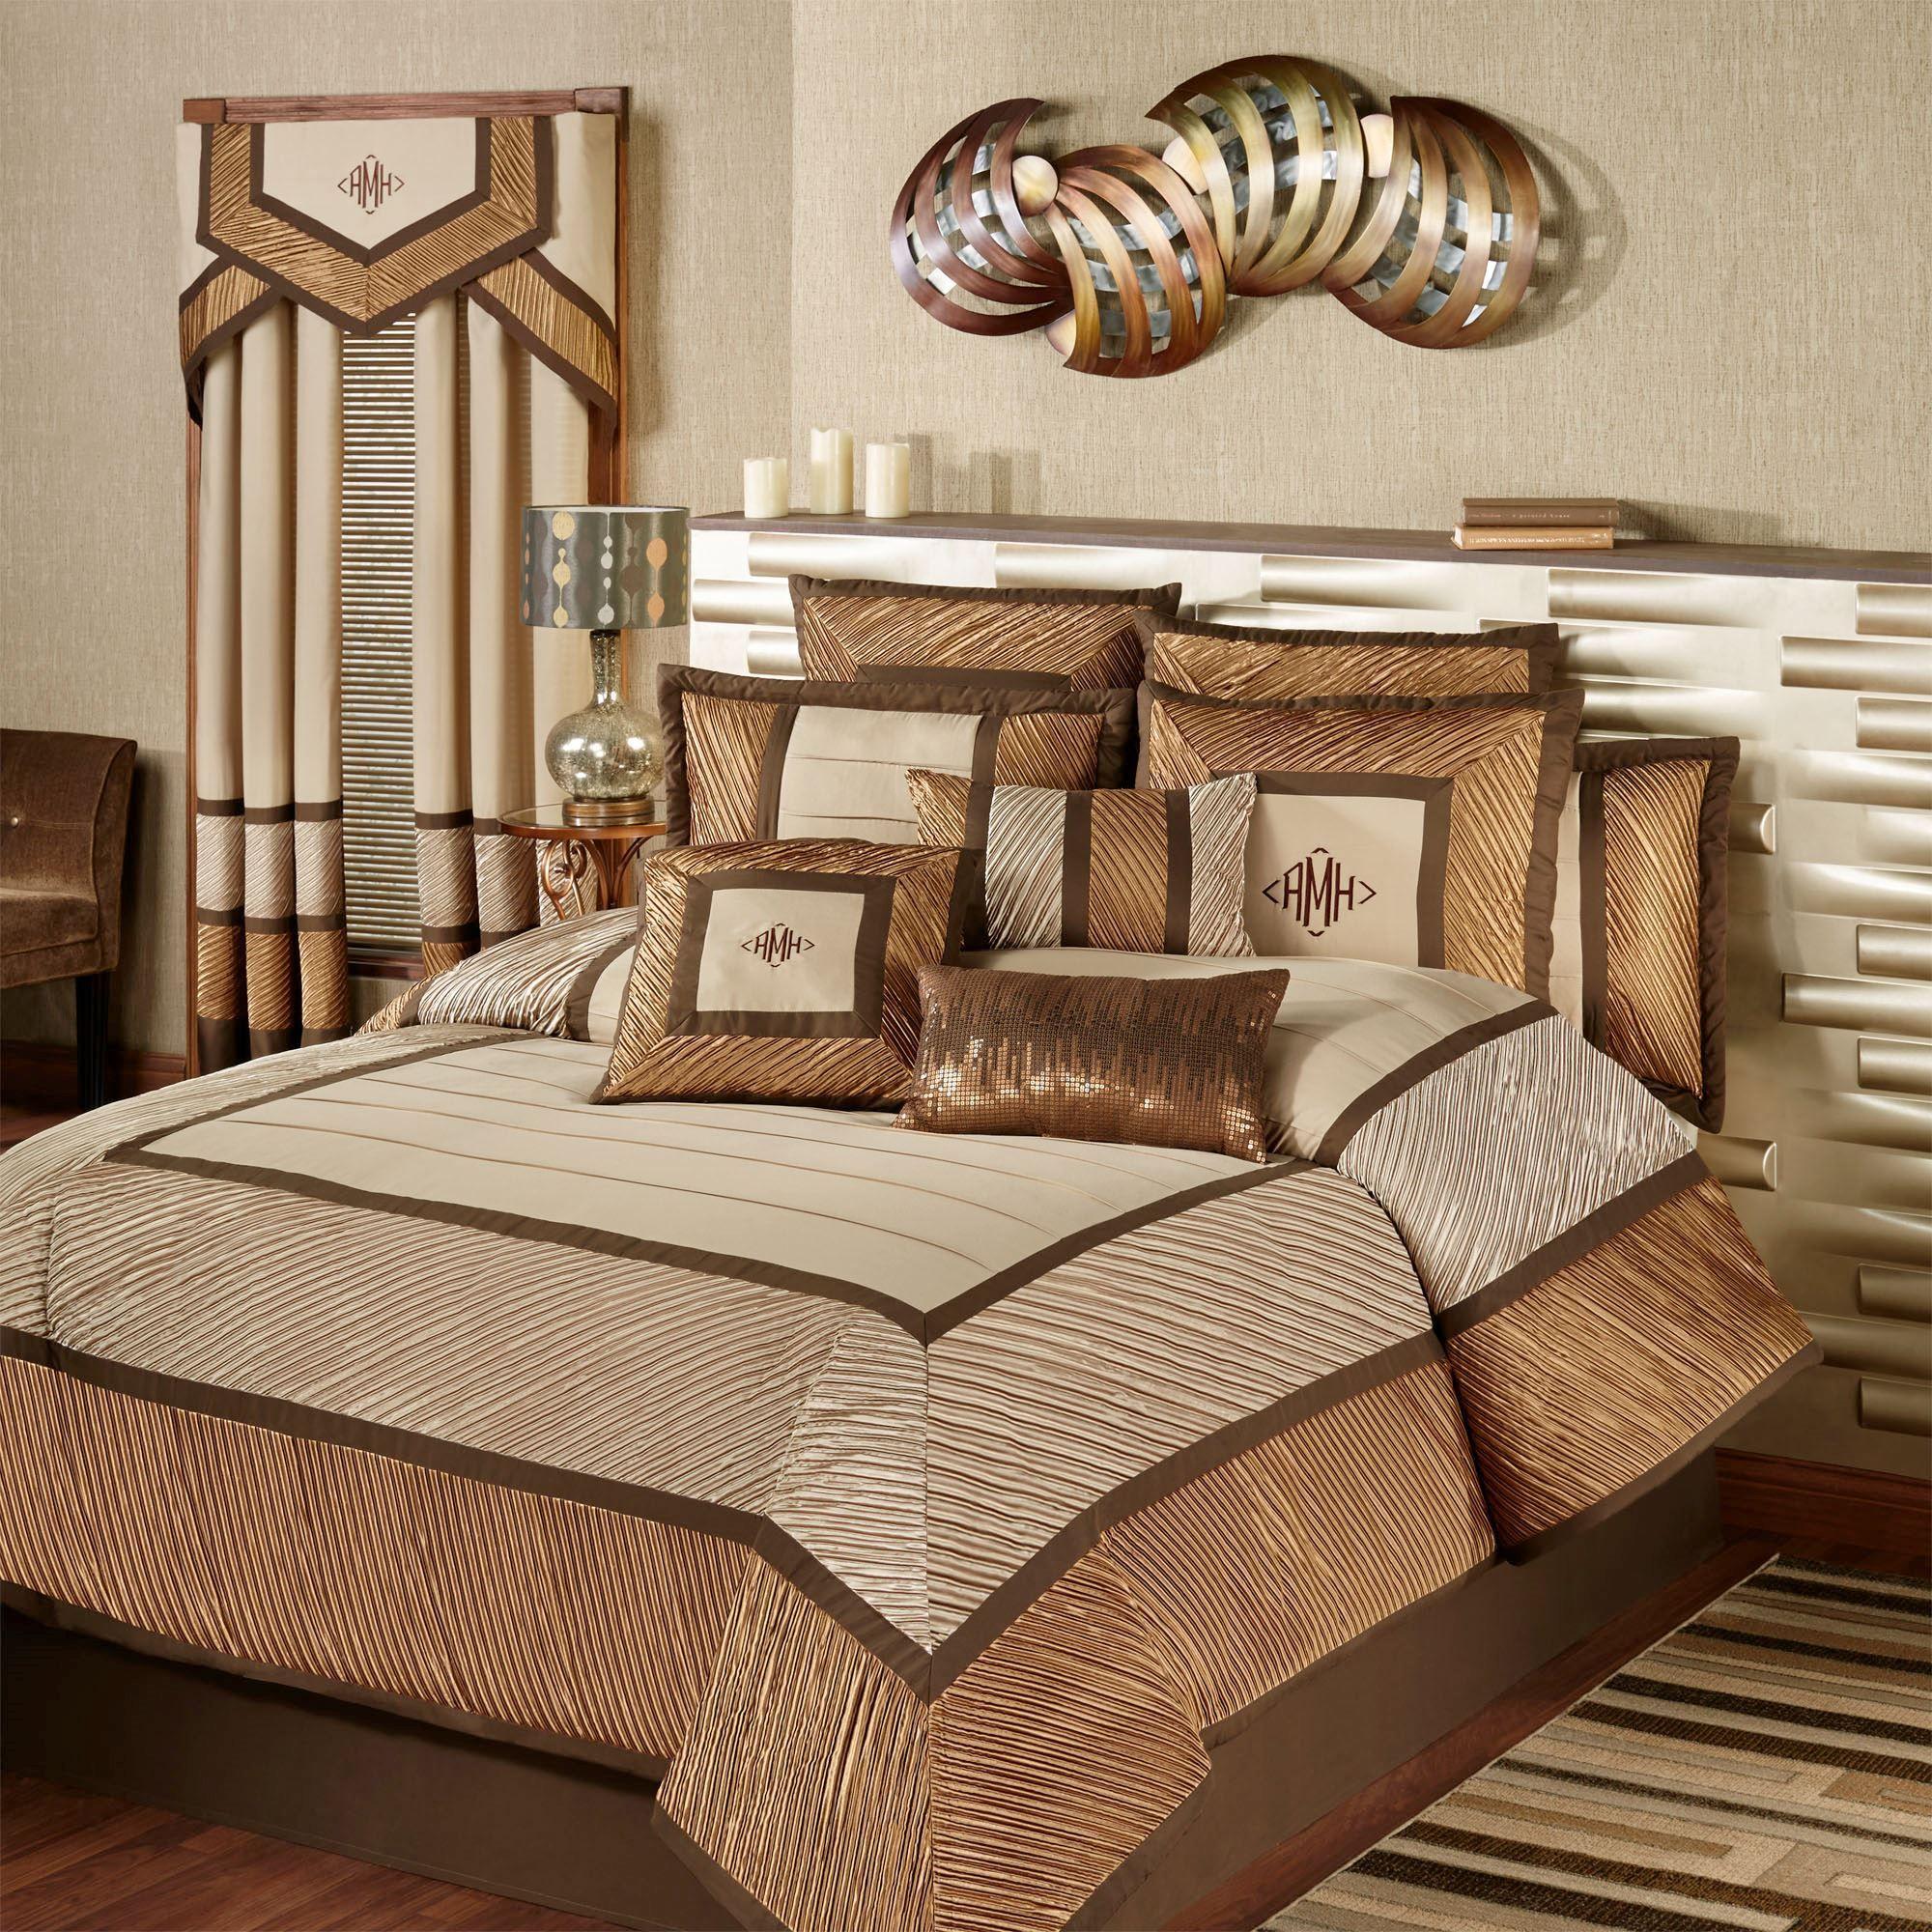 Delta Contemporary Comforter Bedding Bed Linen Sets Bed Linens